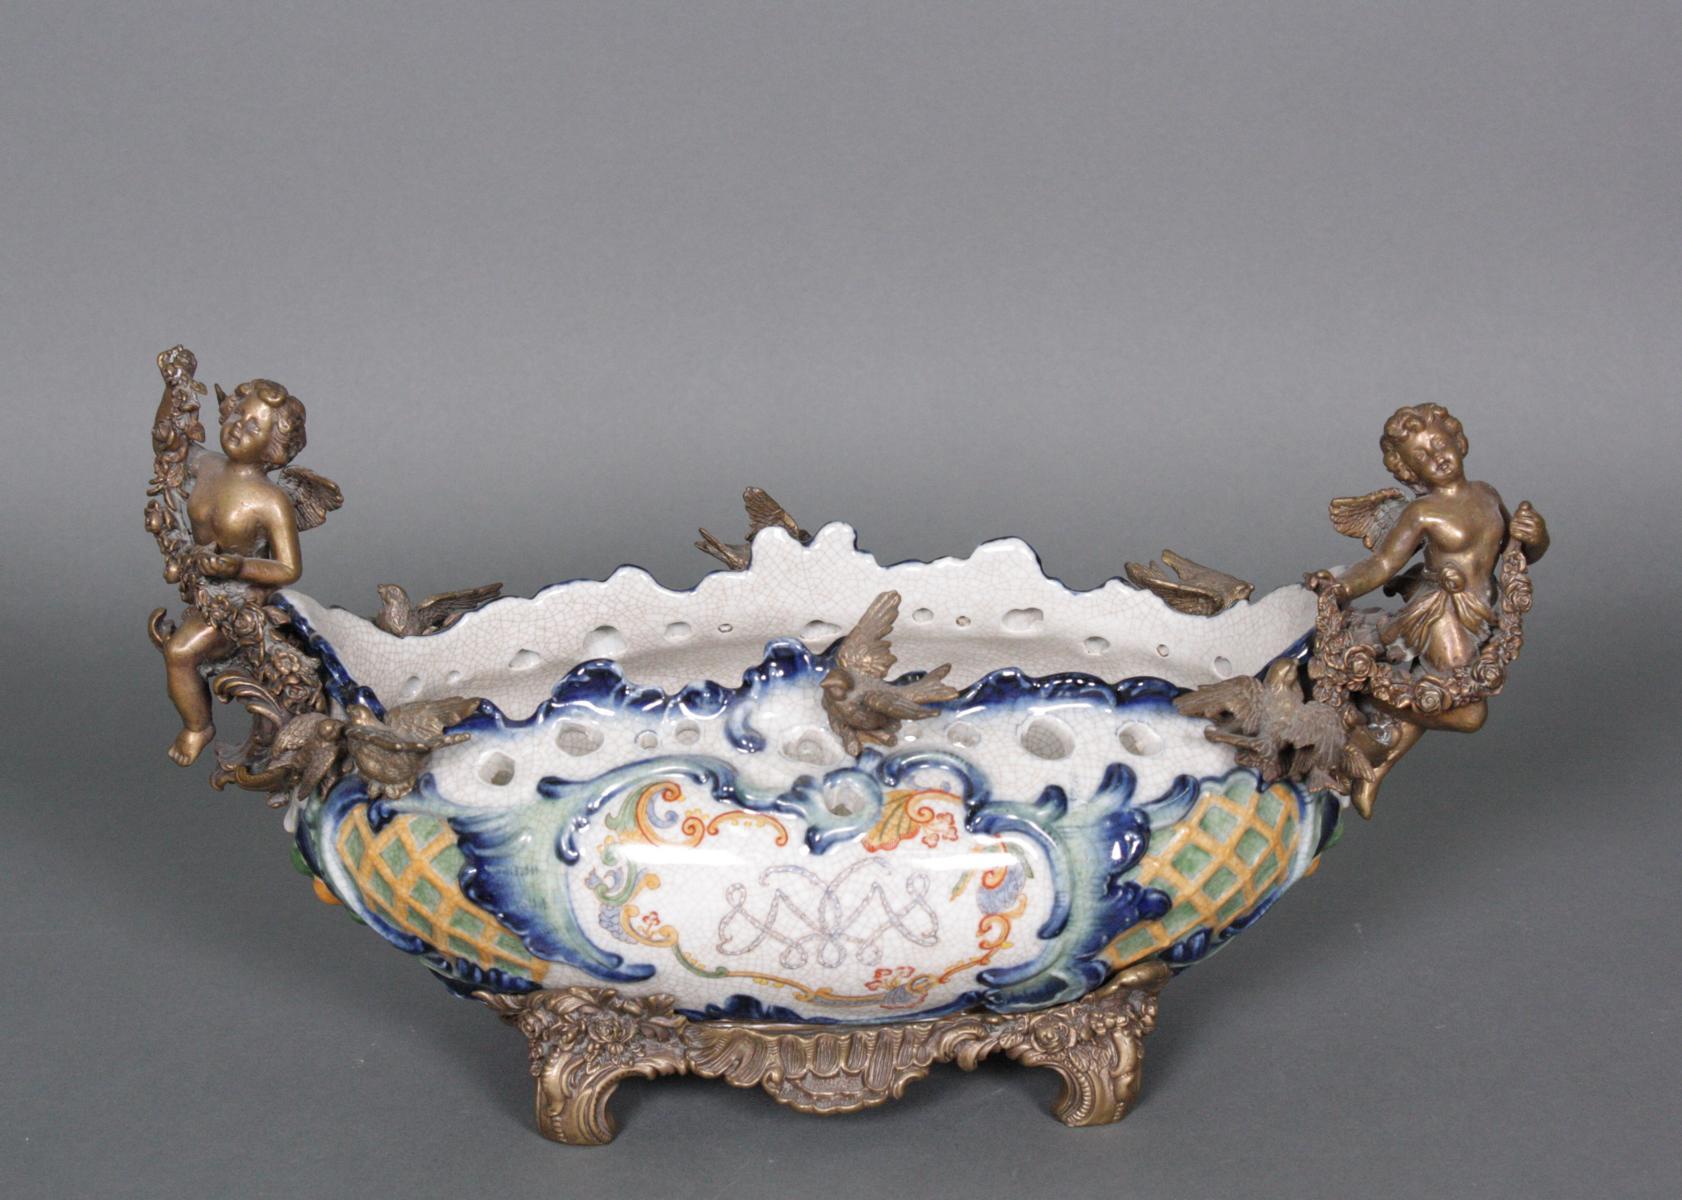 Jardinière, Wong Lee. Porzellan/Keramik